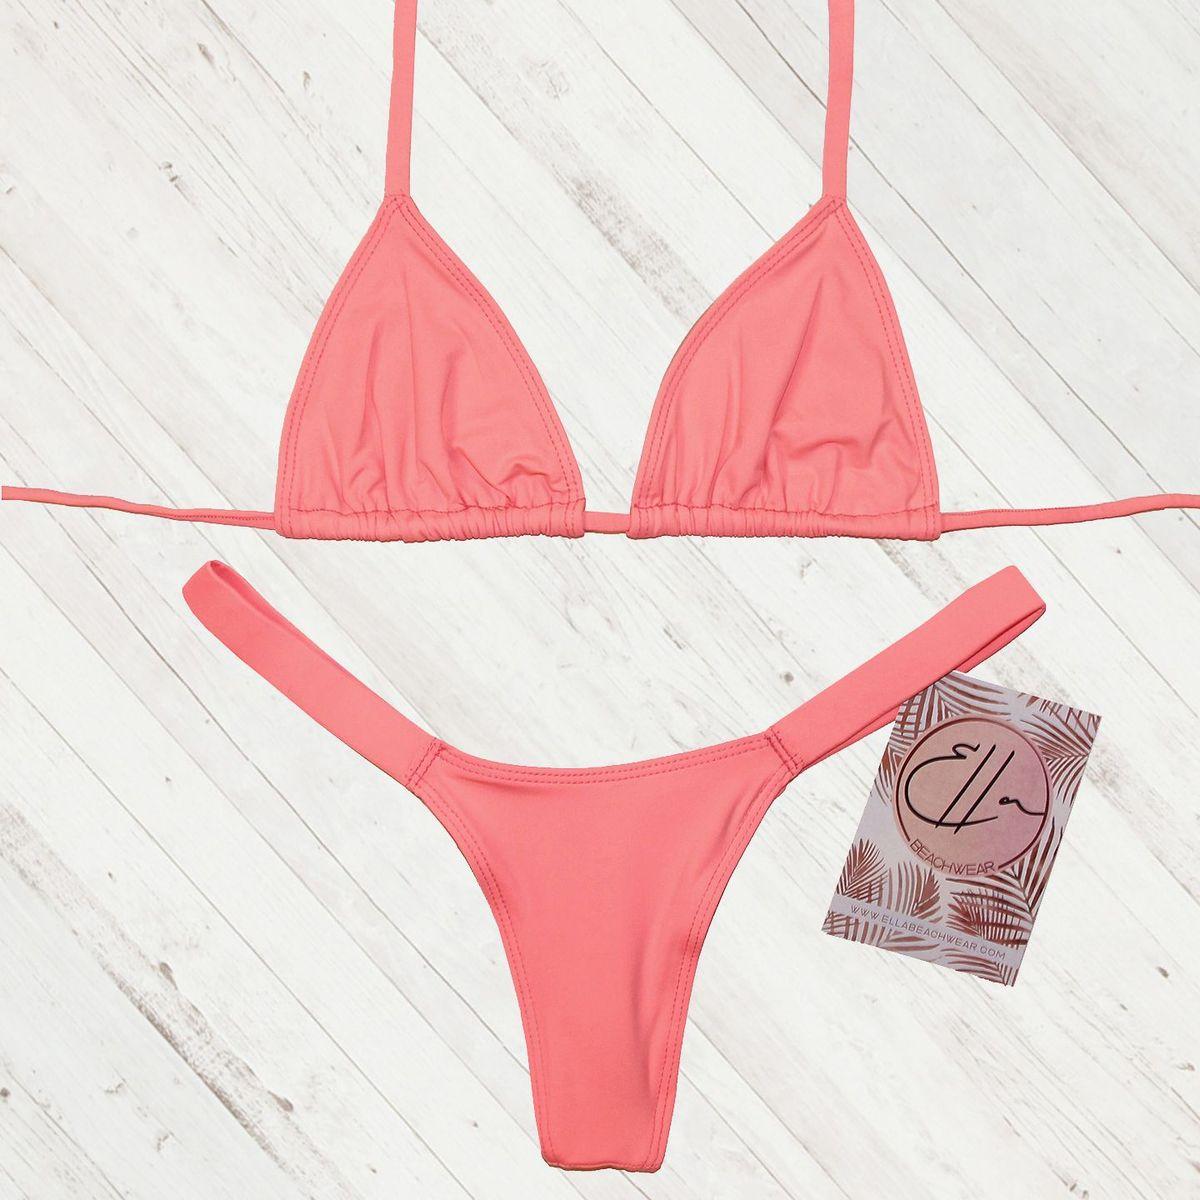 cc6019407 Conjunto Biquíni Marquinha Neon Coral Neon Rosa Fio Dental Cortininha Semi  Fio Asa Delta Verão | Moda Praia Feminina Ella Beachwear Nunca Usado  32721972 | ...